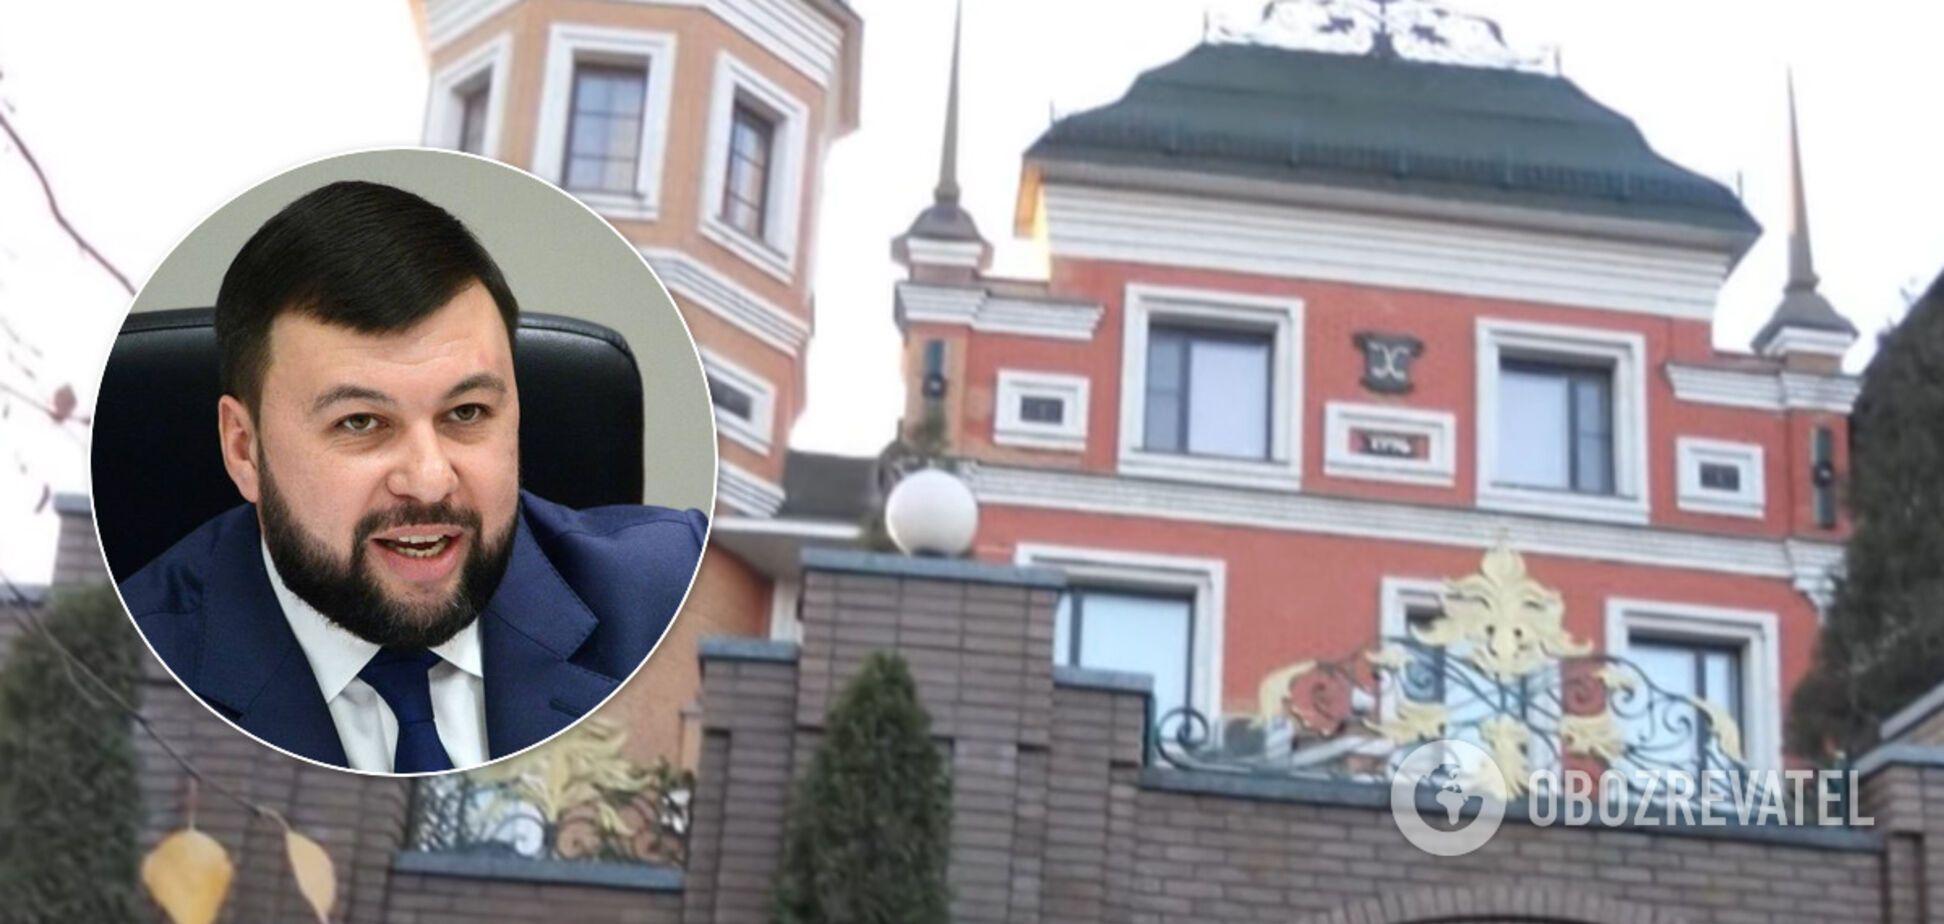 Пушилин захватил дом бизнесмена в Донецке